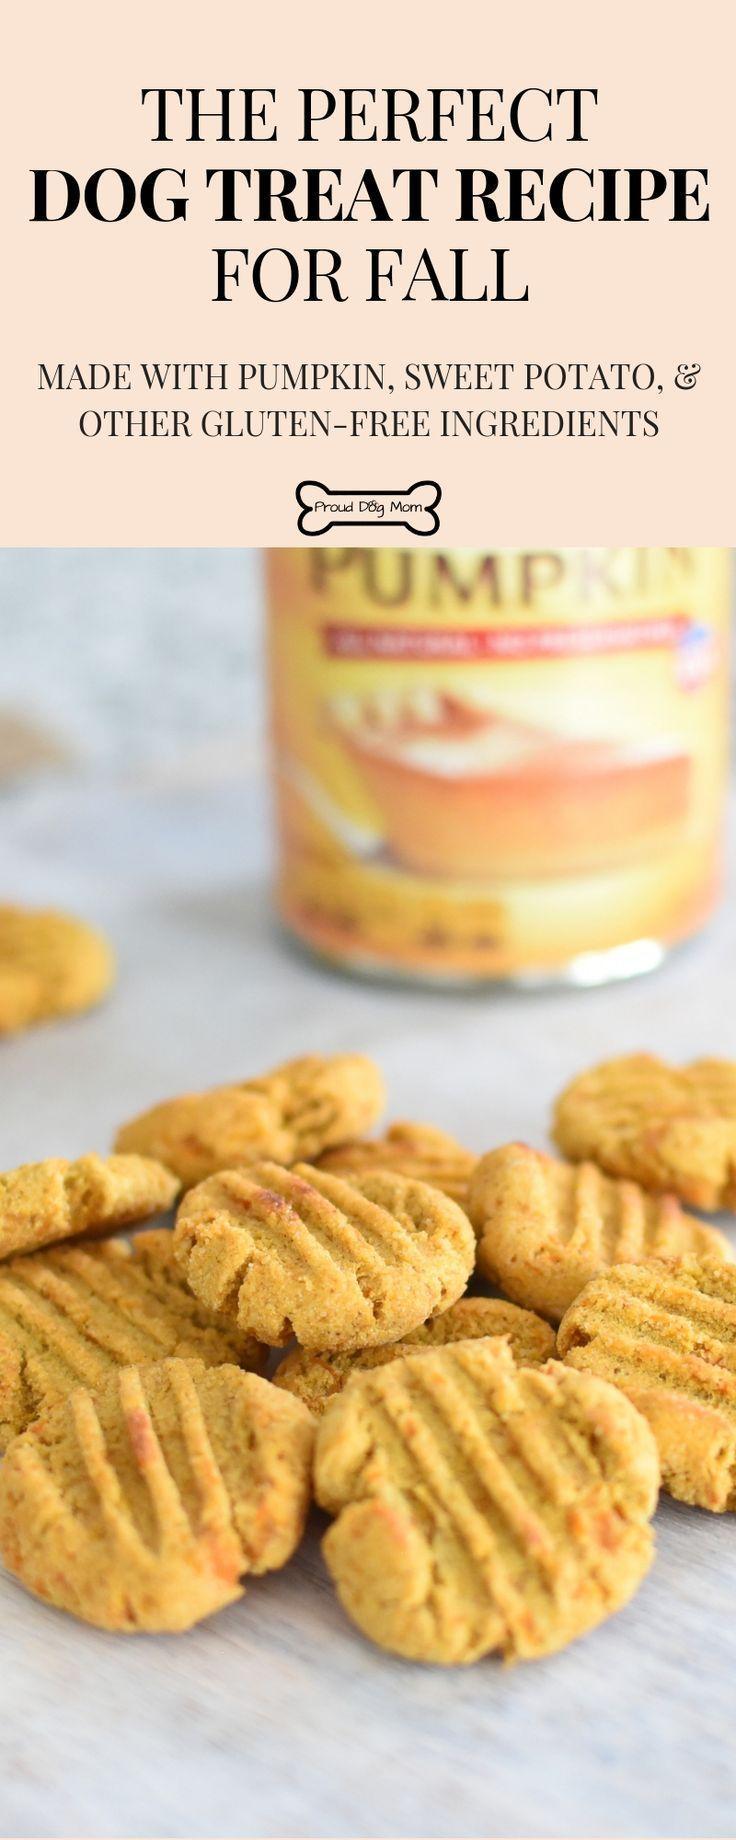 Pumpkin Sweet Potato Bites Recipe Sweet Potatoes For Dogs Dog